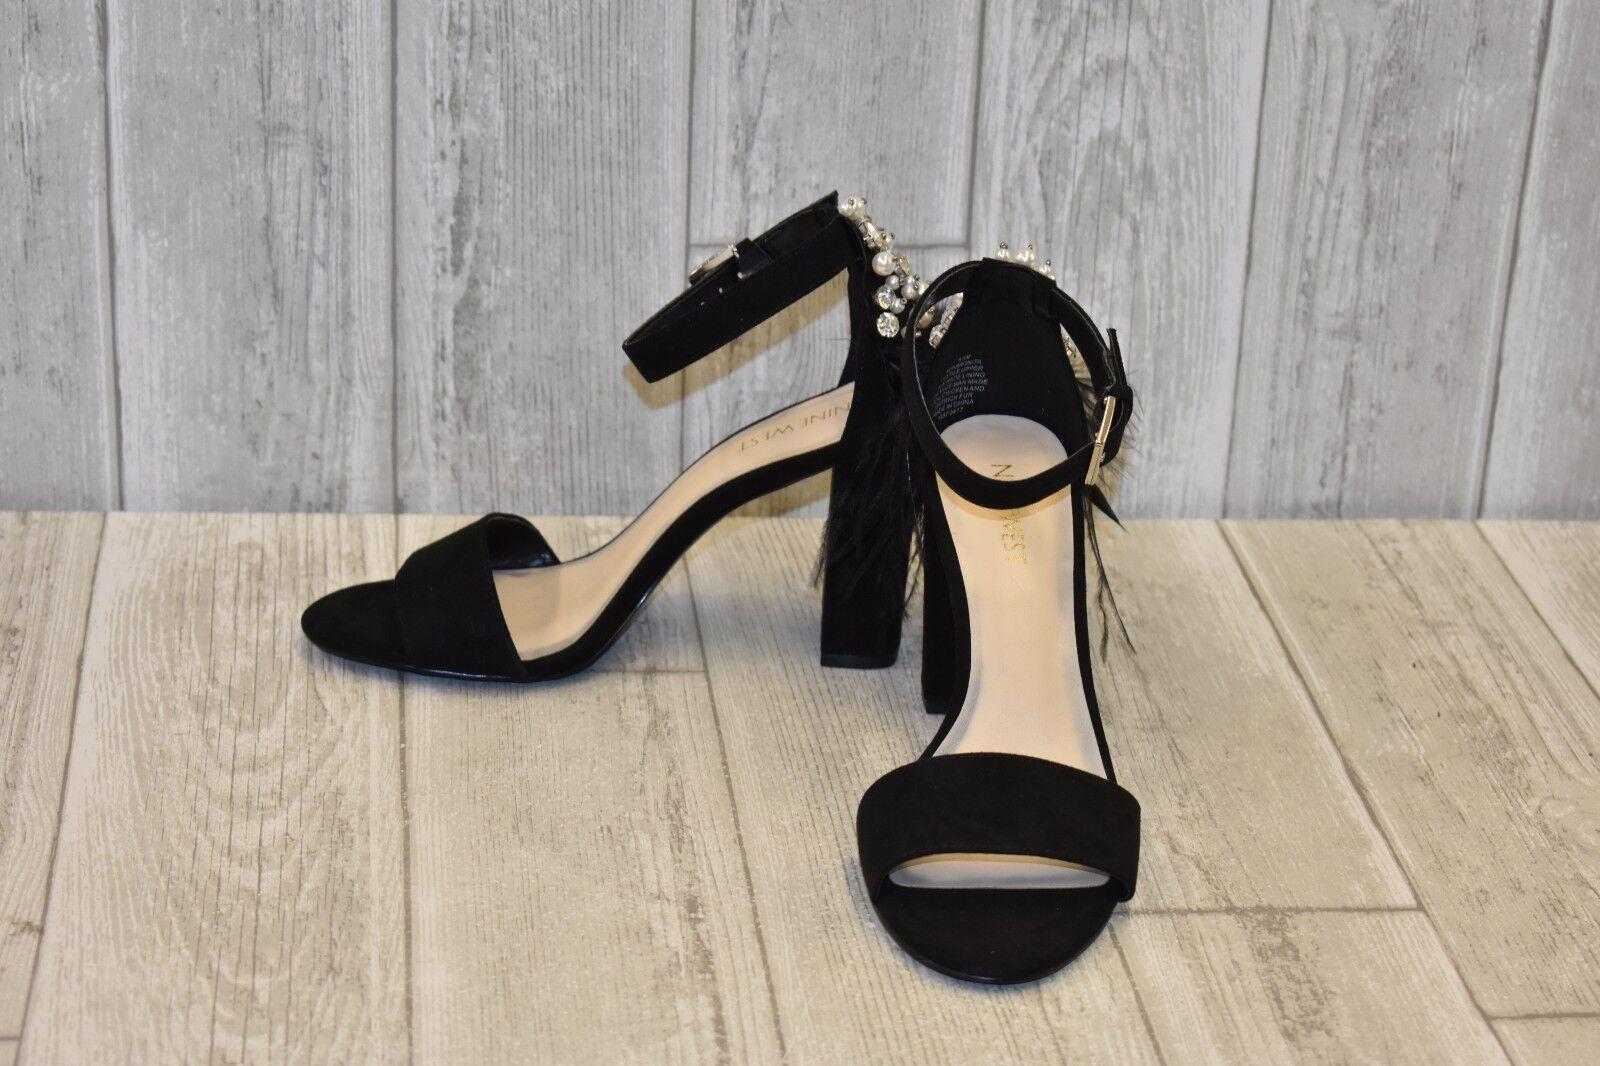 Nine West Aaronita Heeled Sandal - Women's Size 6.5M - Black